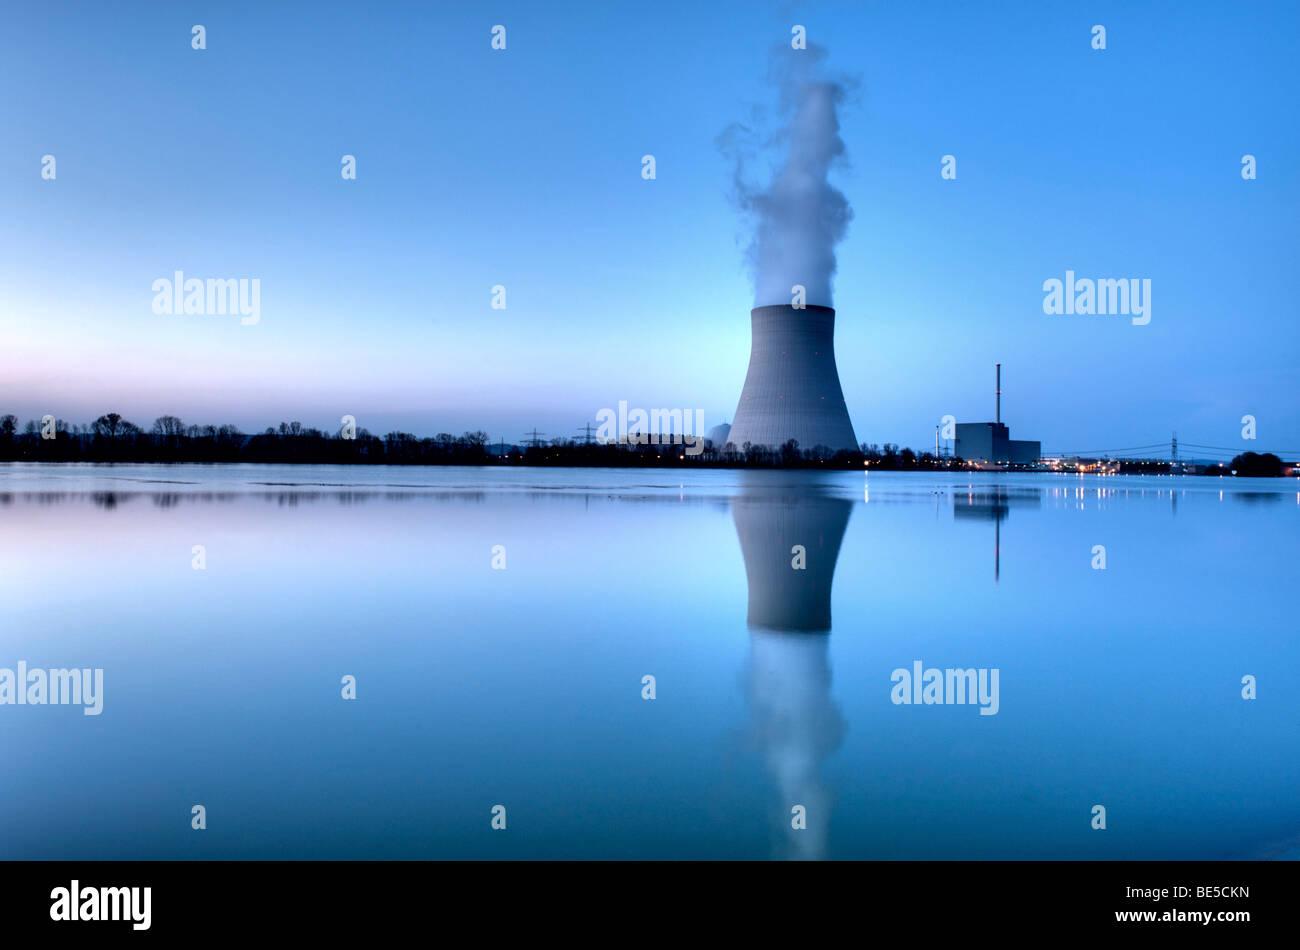 Isar Nuclear Power Plant, Ohu, in Essenbach near Landshut, Lower Bavaria, Bavaria, Germany, Europe - Stock Image